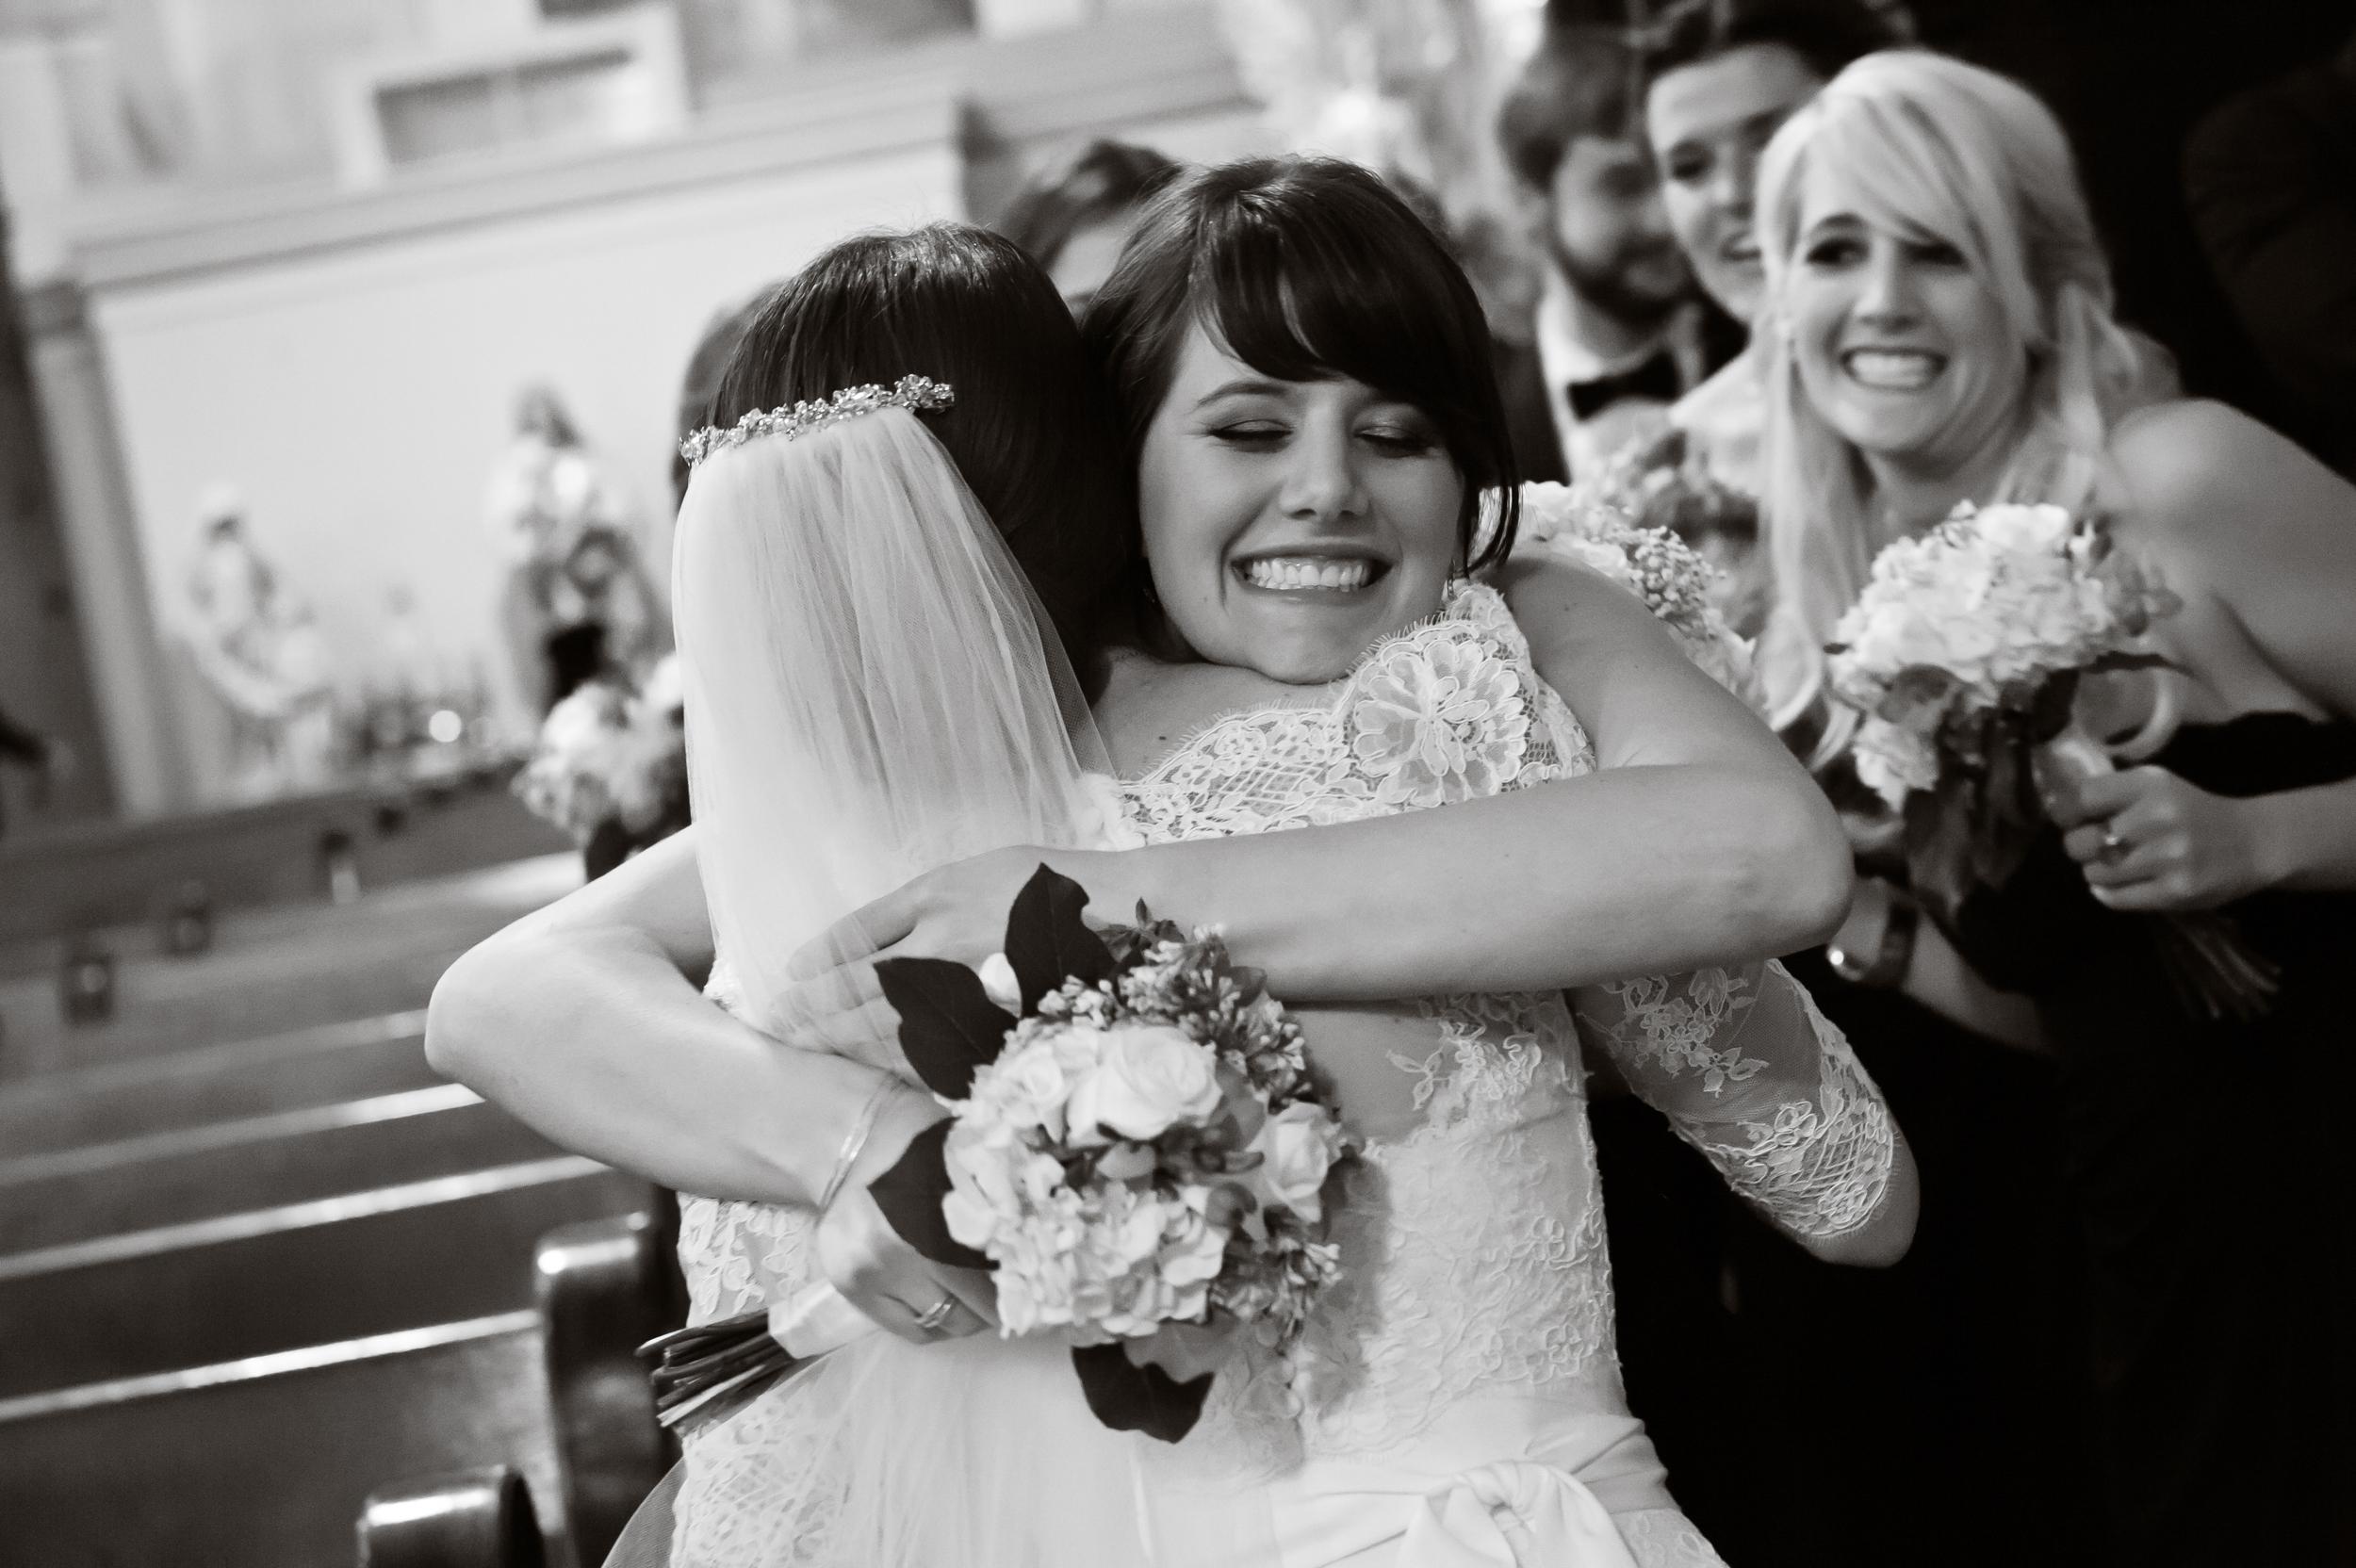 Congratulations, Here's a Hug